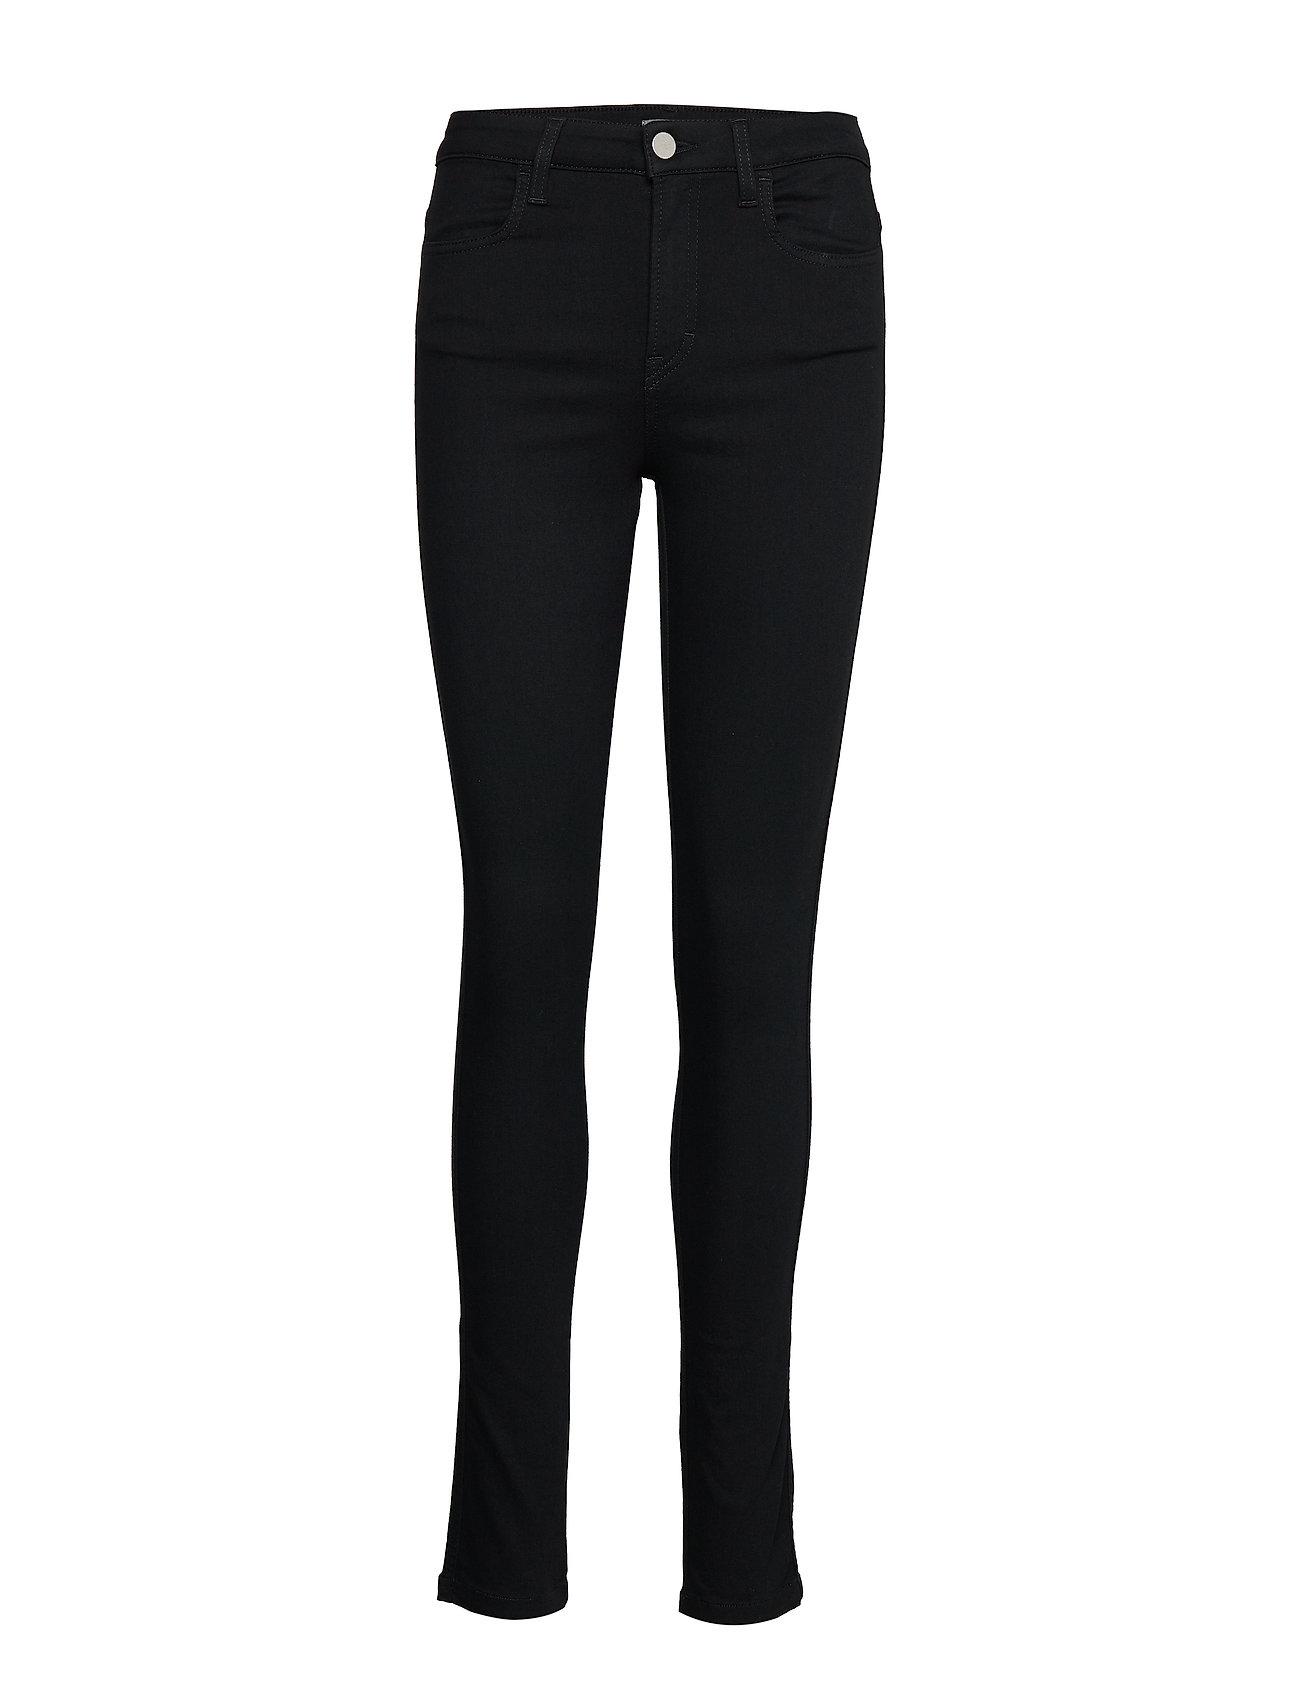 Filippa K Lola Super Stretch Jeans - BLACK